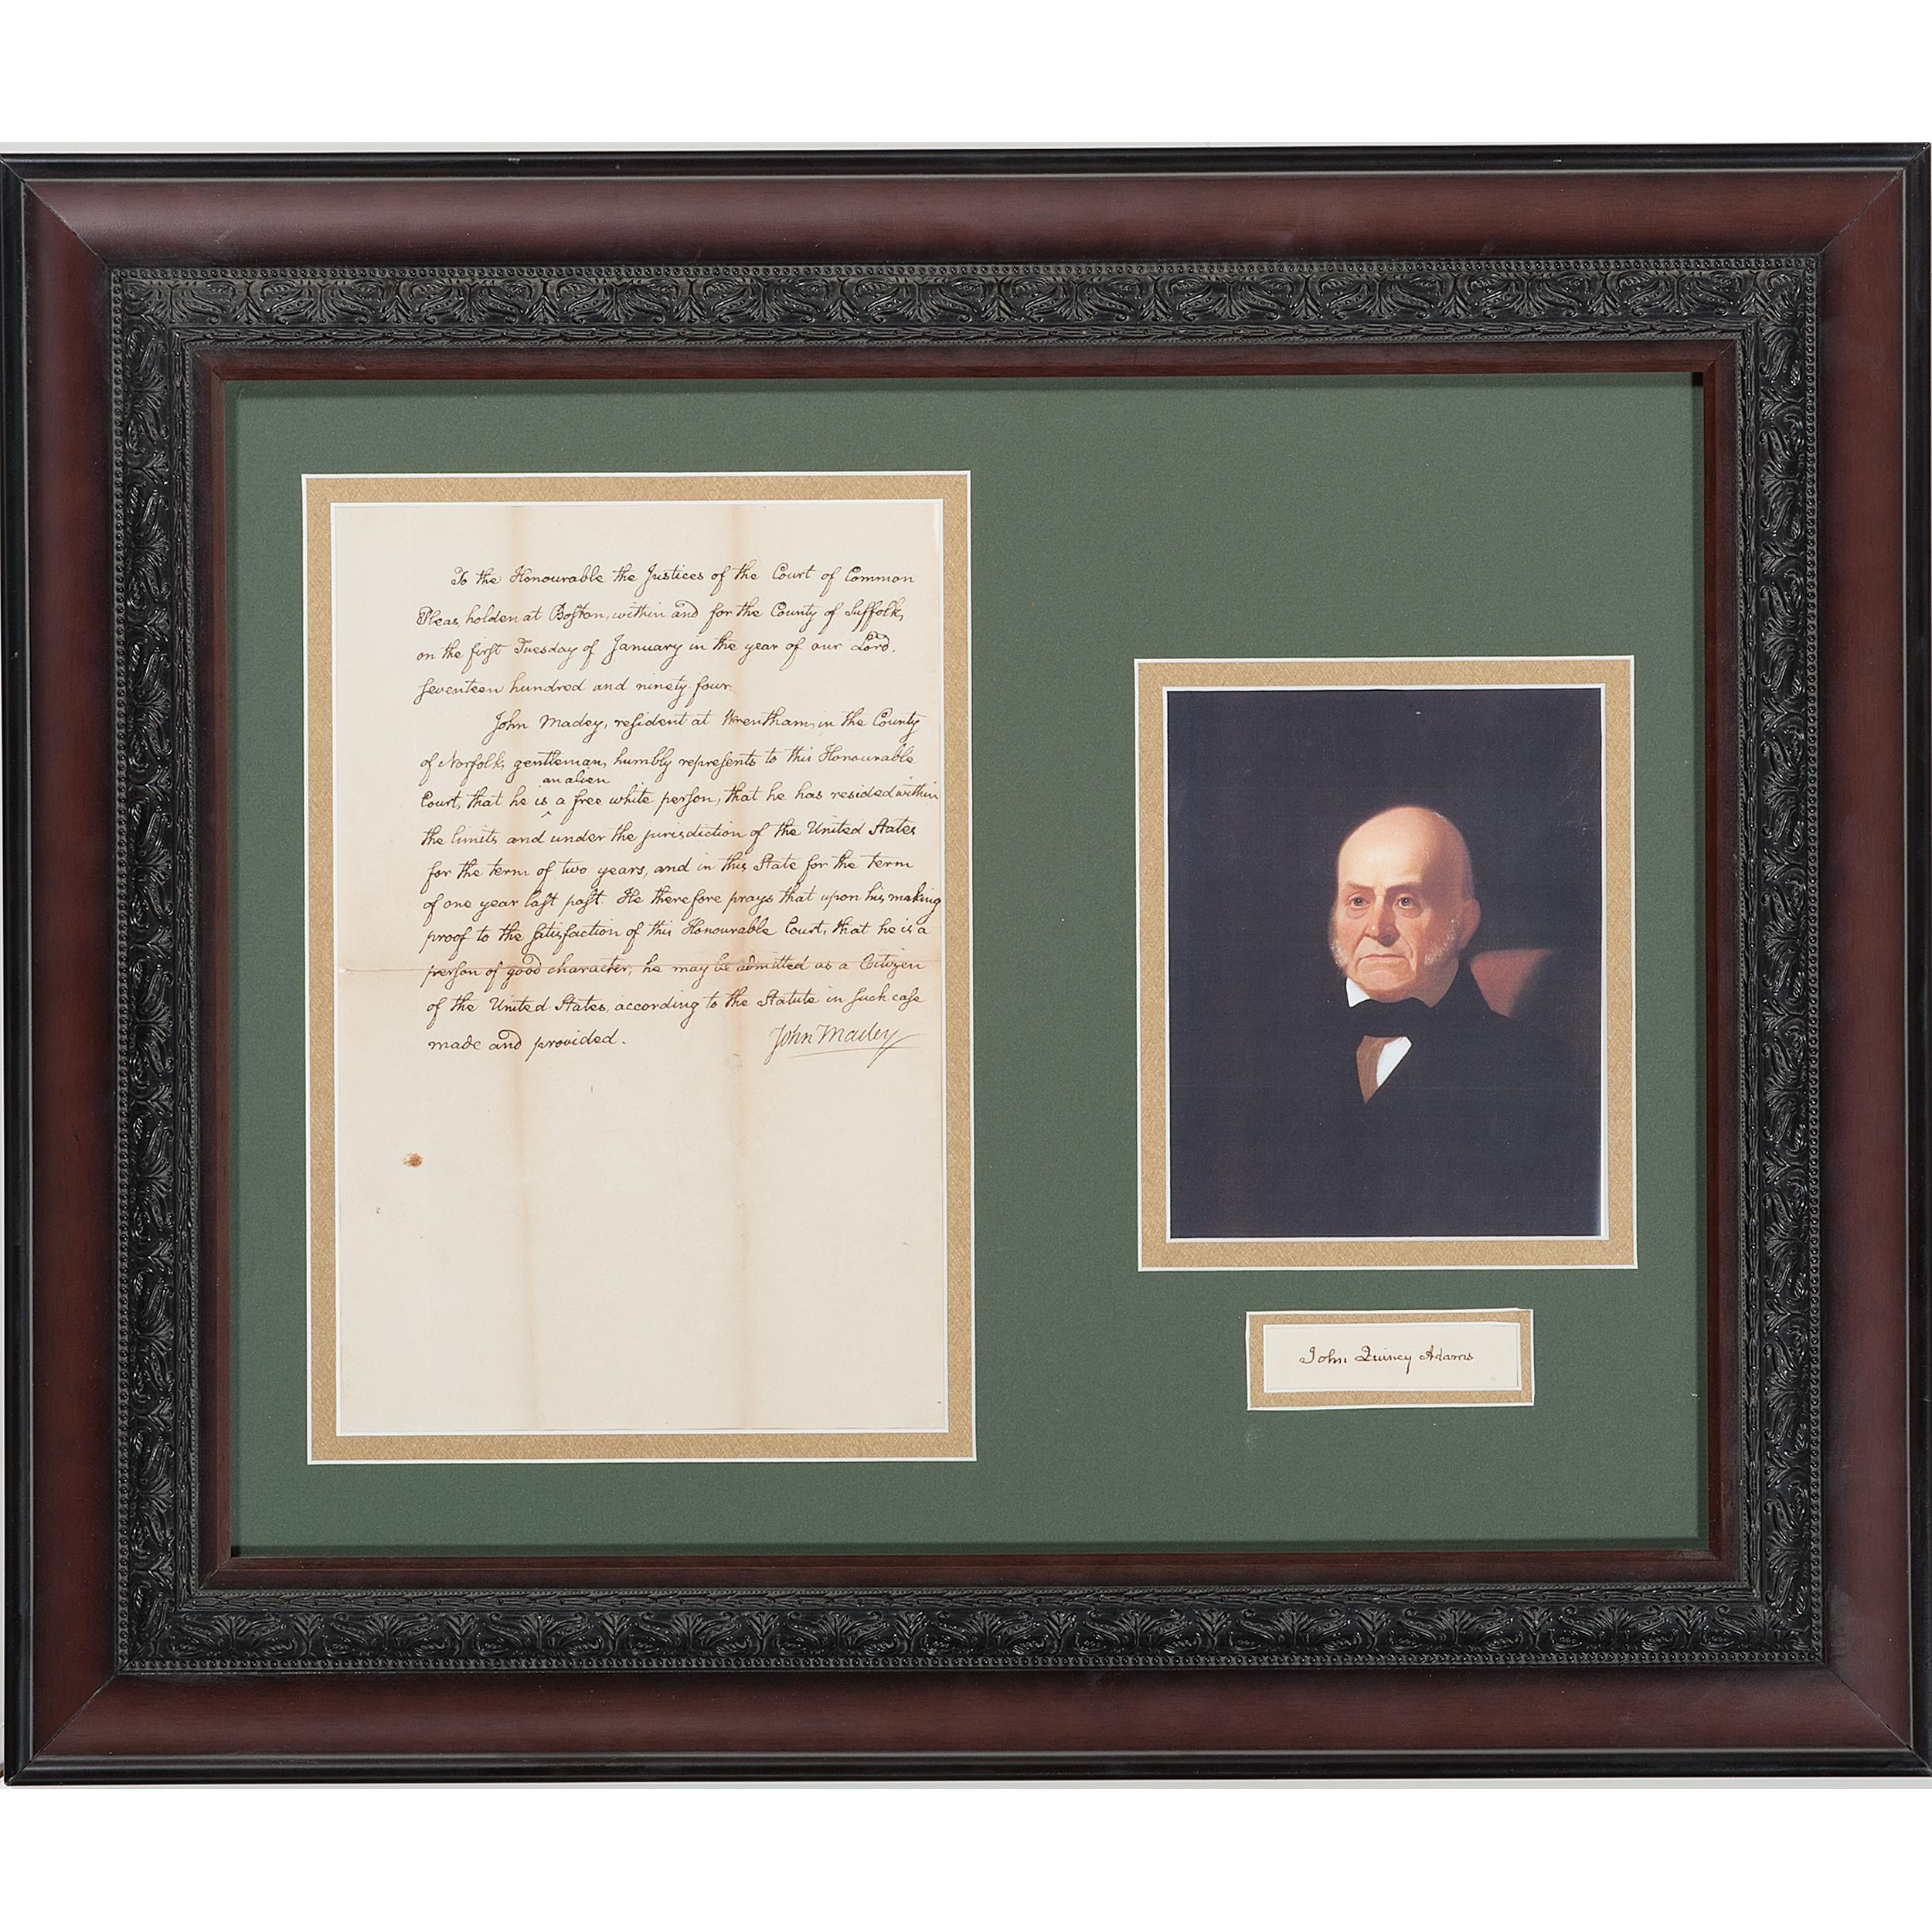 John Quincy Adams Clipped Signature And M Cript